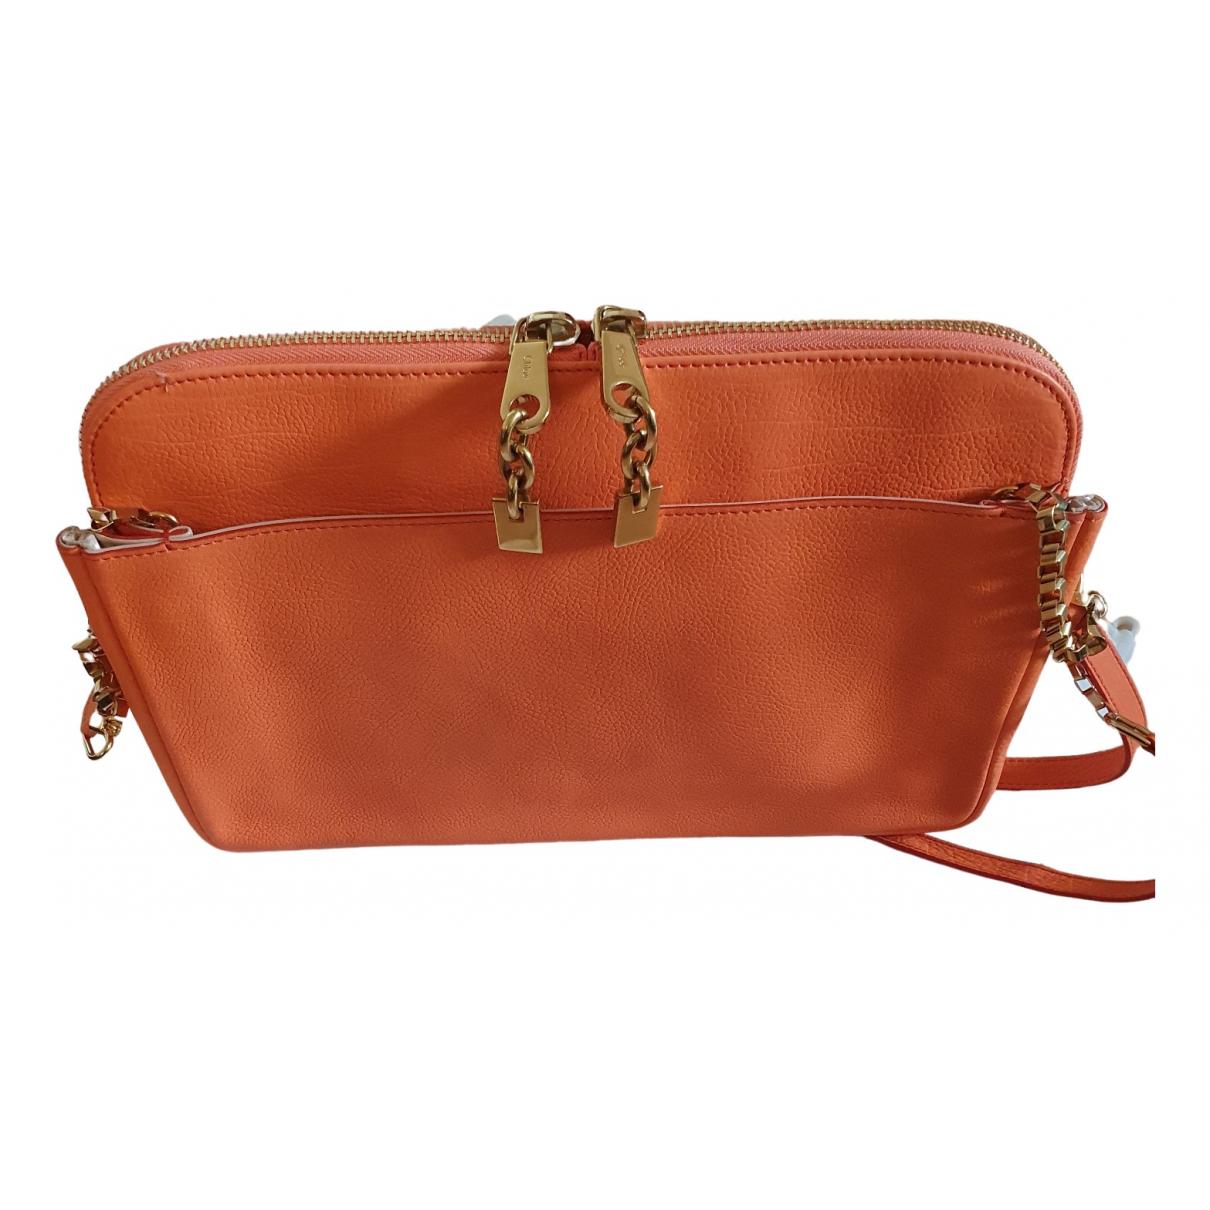 Chloé Lucy Orange Leather handbag for Women N